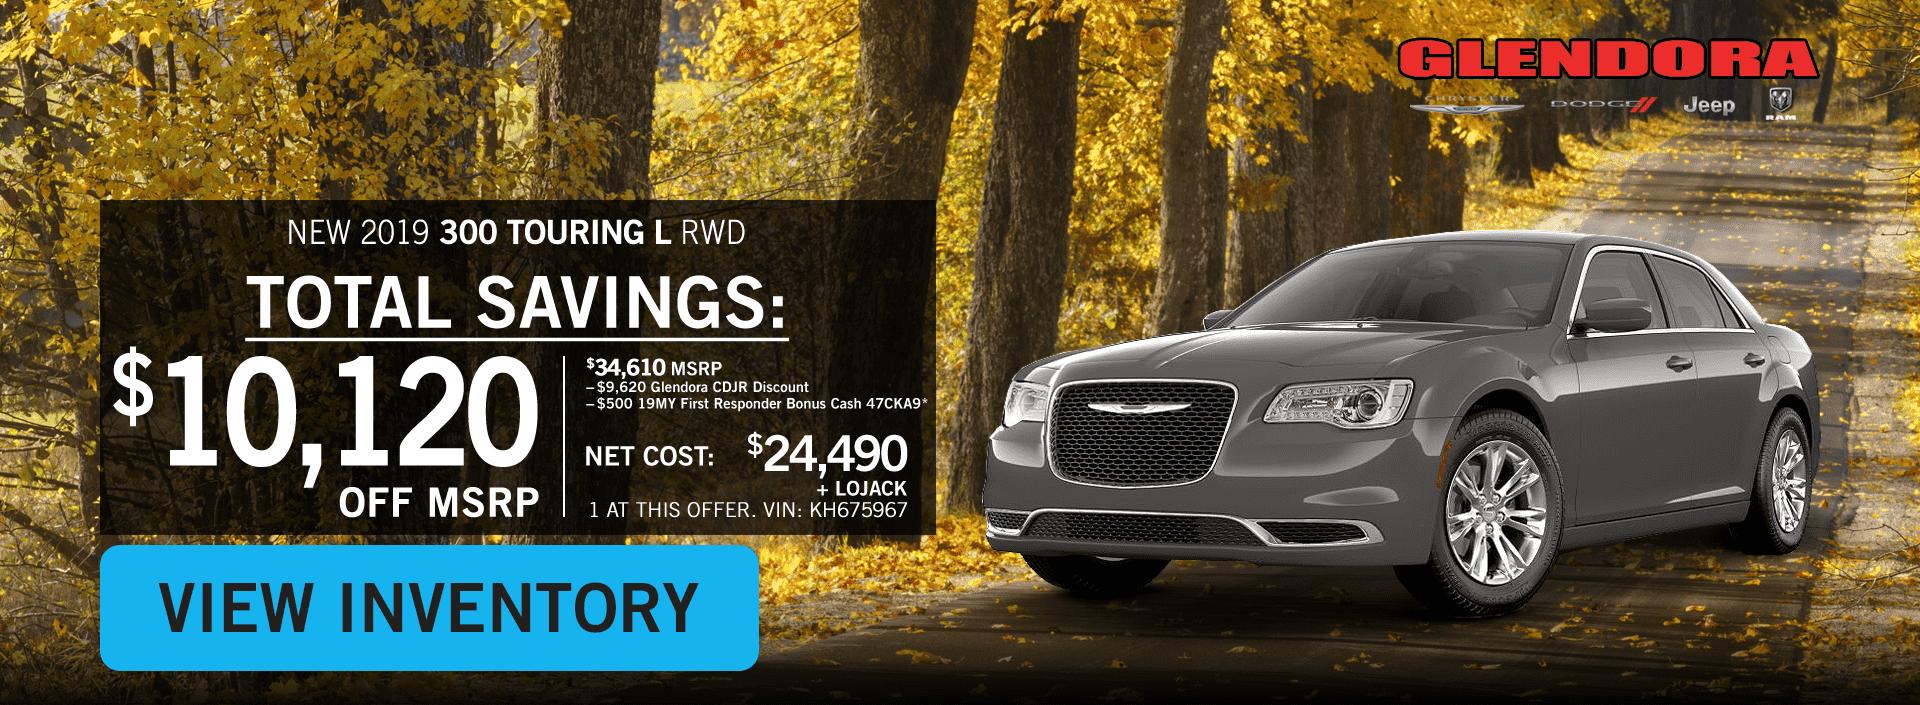 Glendora_CDJR_2020_October_Deals_Family_Pricing_Chrysler_300_Home